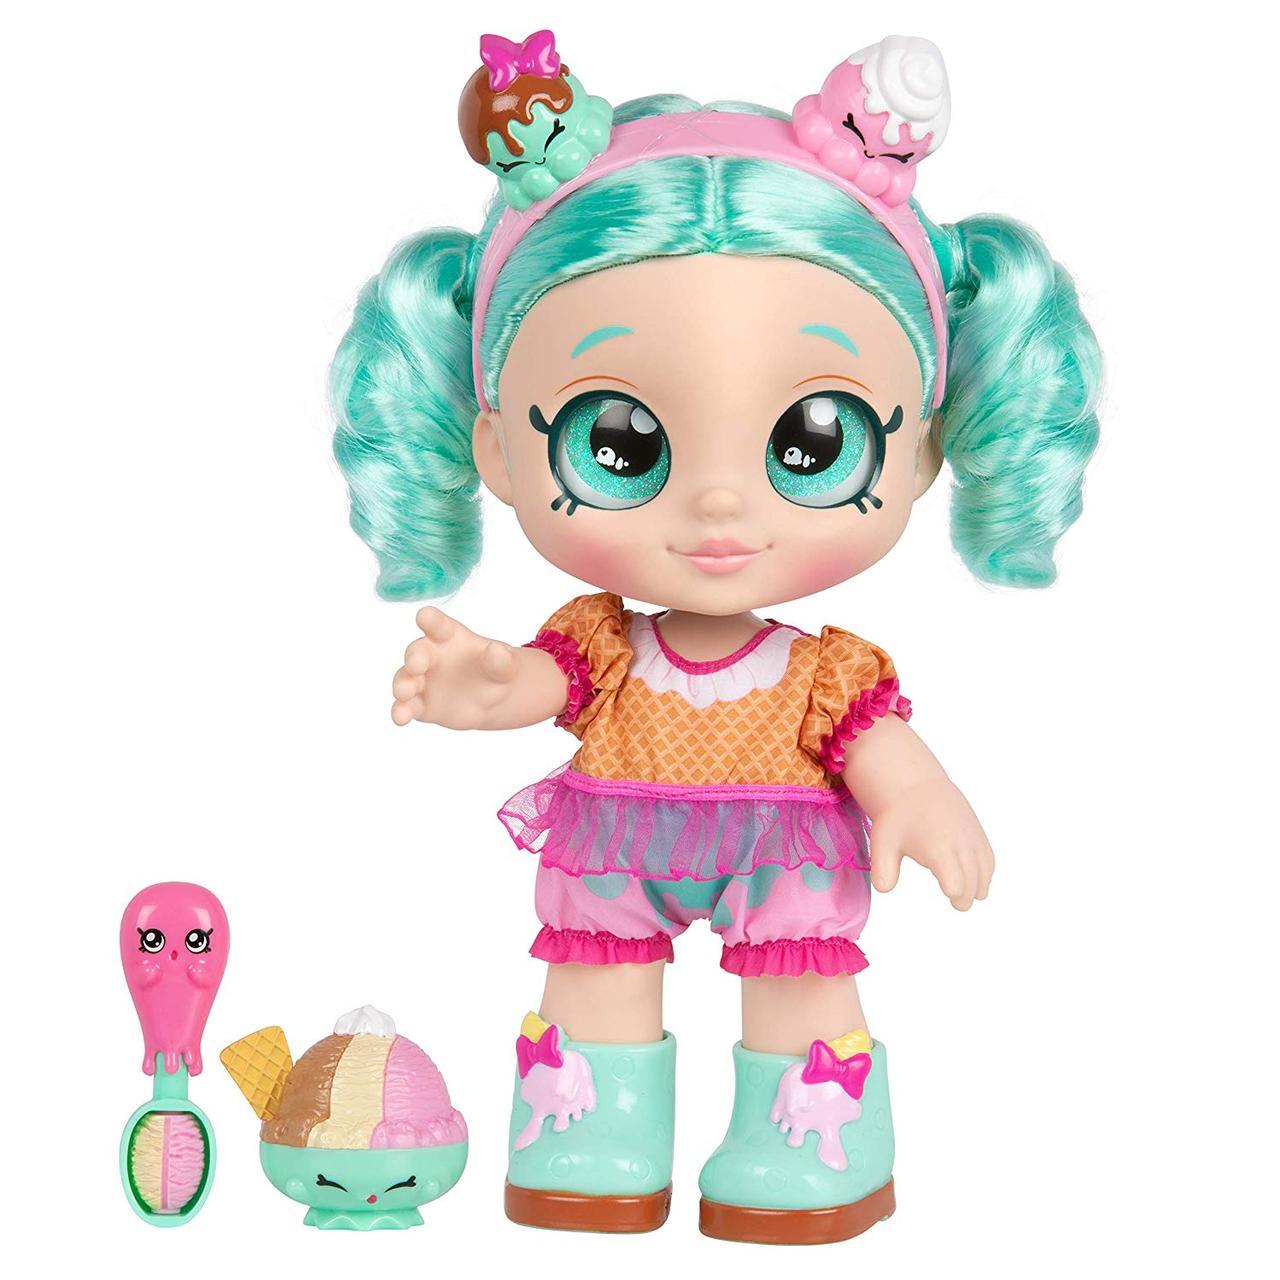 Кукла Пеппа Минт (мороженое) серии Kindi Kids Кинди Кидс с аксессуарами